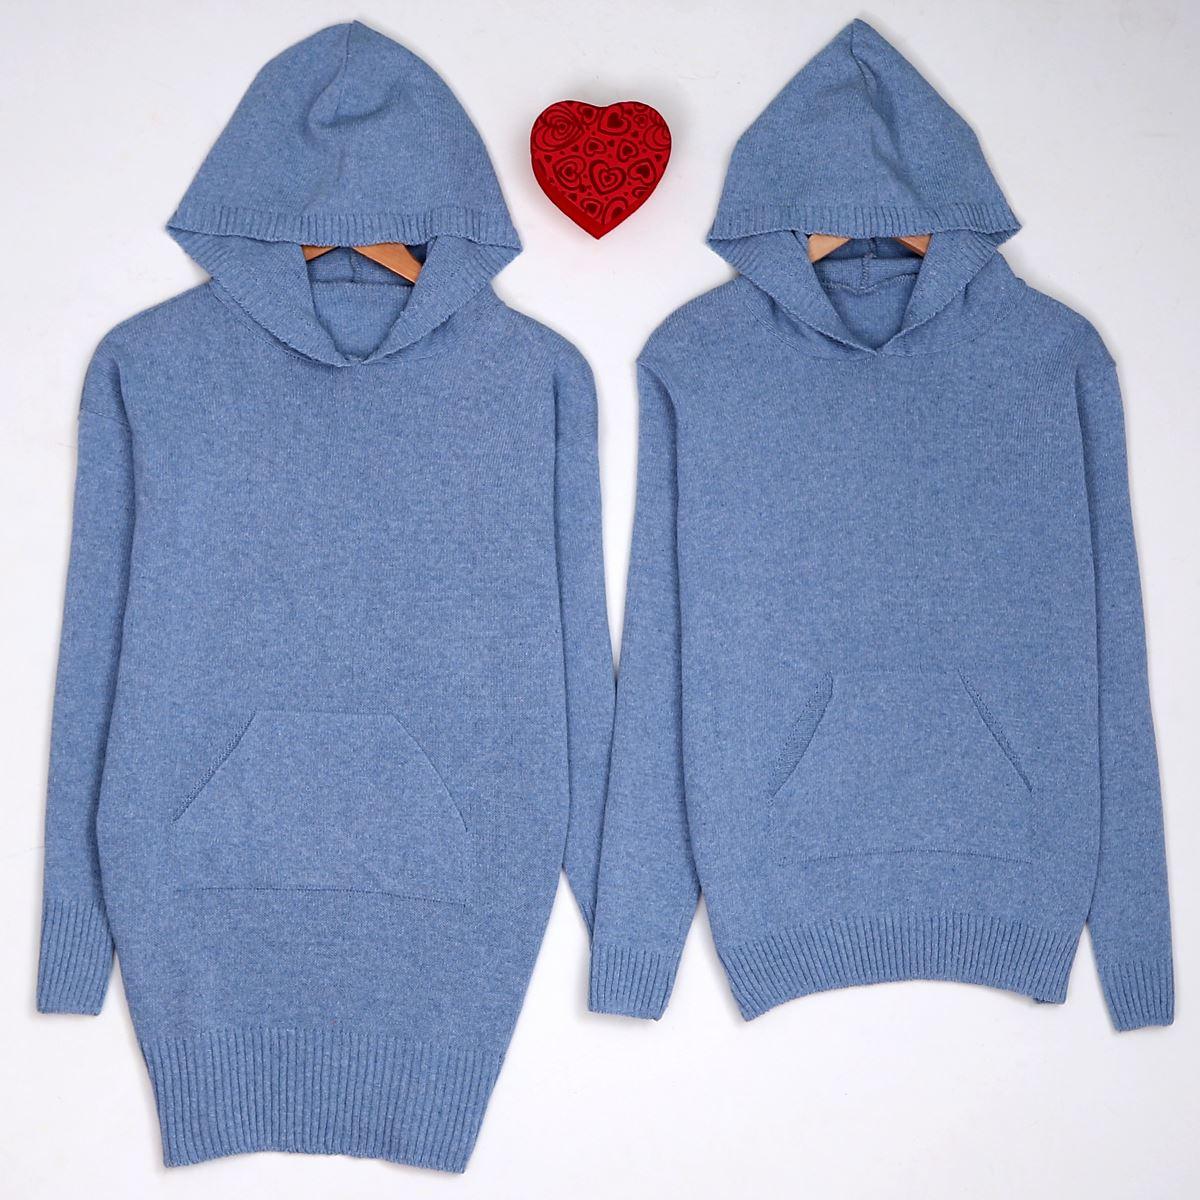 Mavi Kapşonlu Sevgili Kombini SVG109